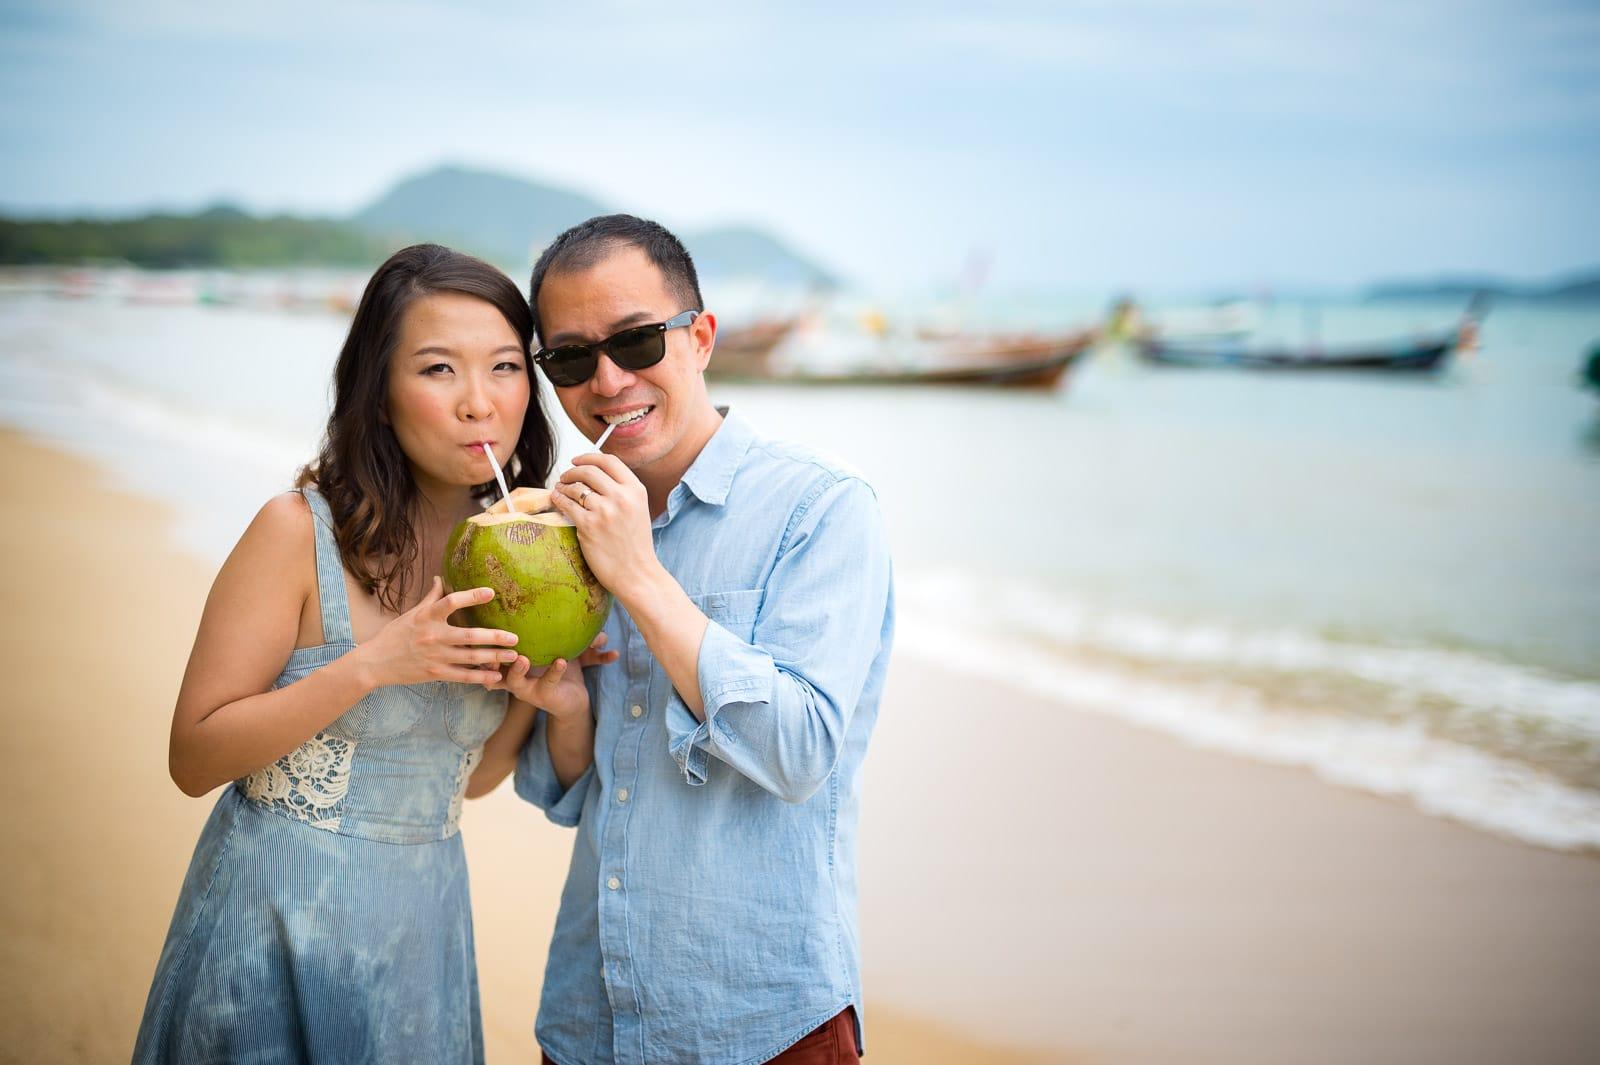 phuket-prewedding-photographer-thailand-wedding-photography-010